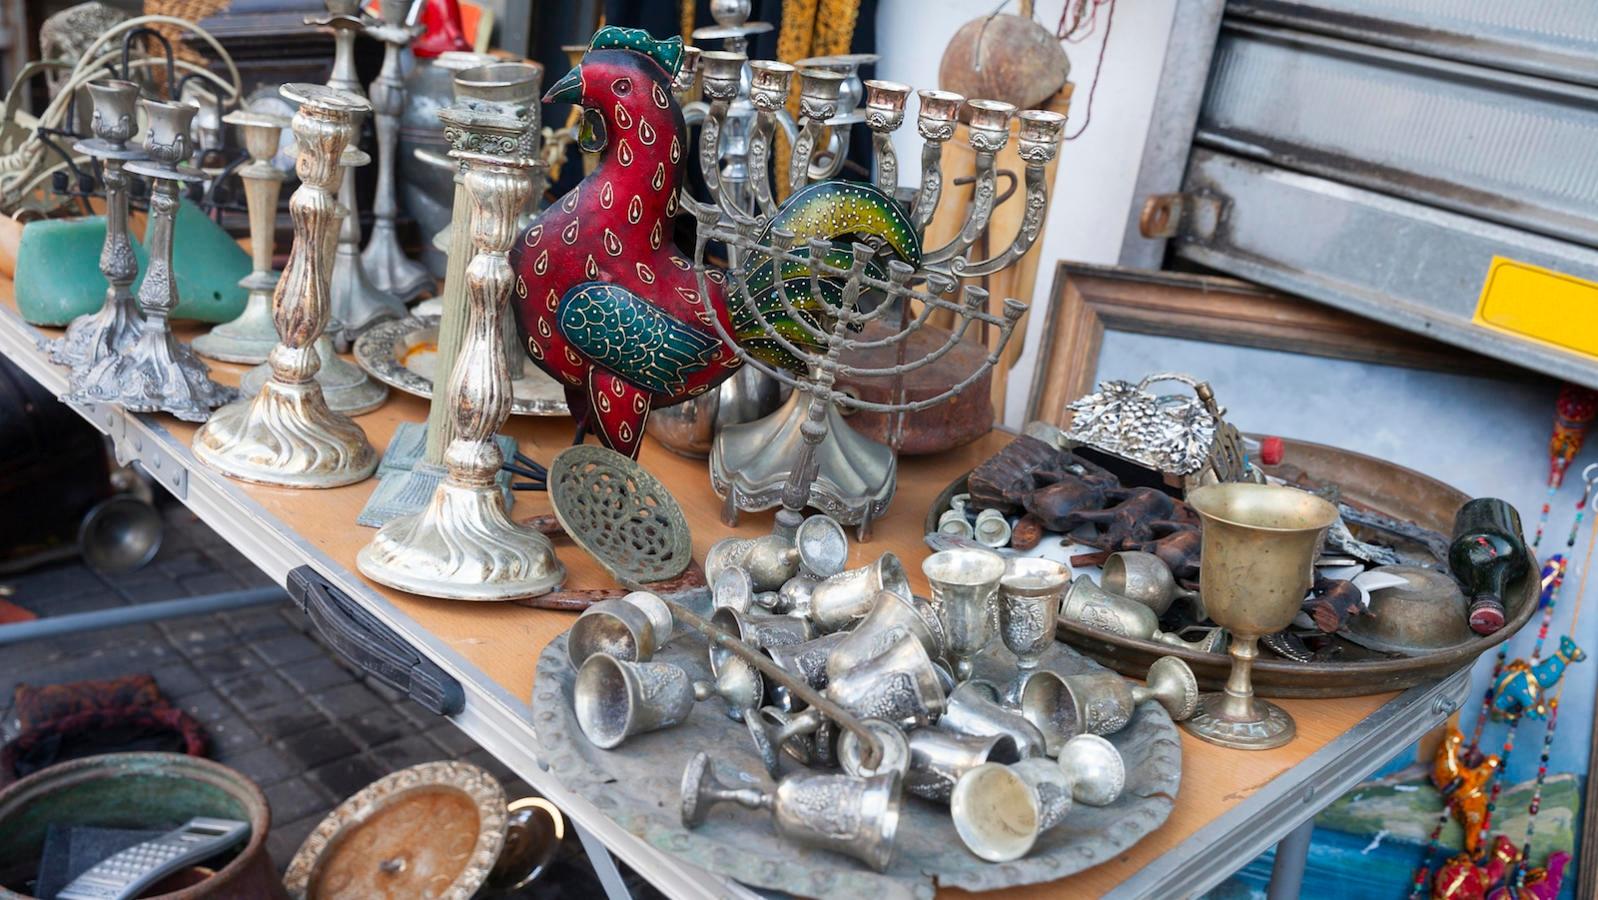 judaica ritual objects